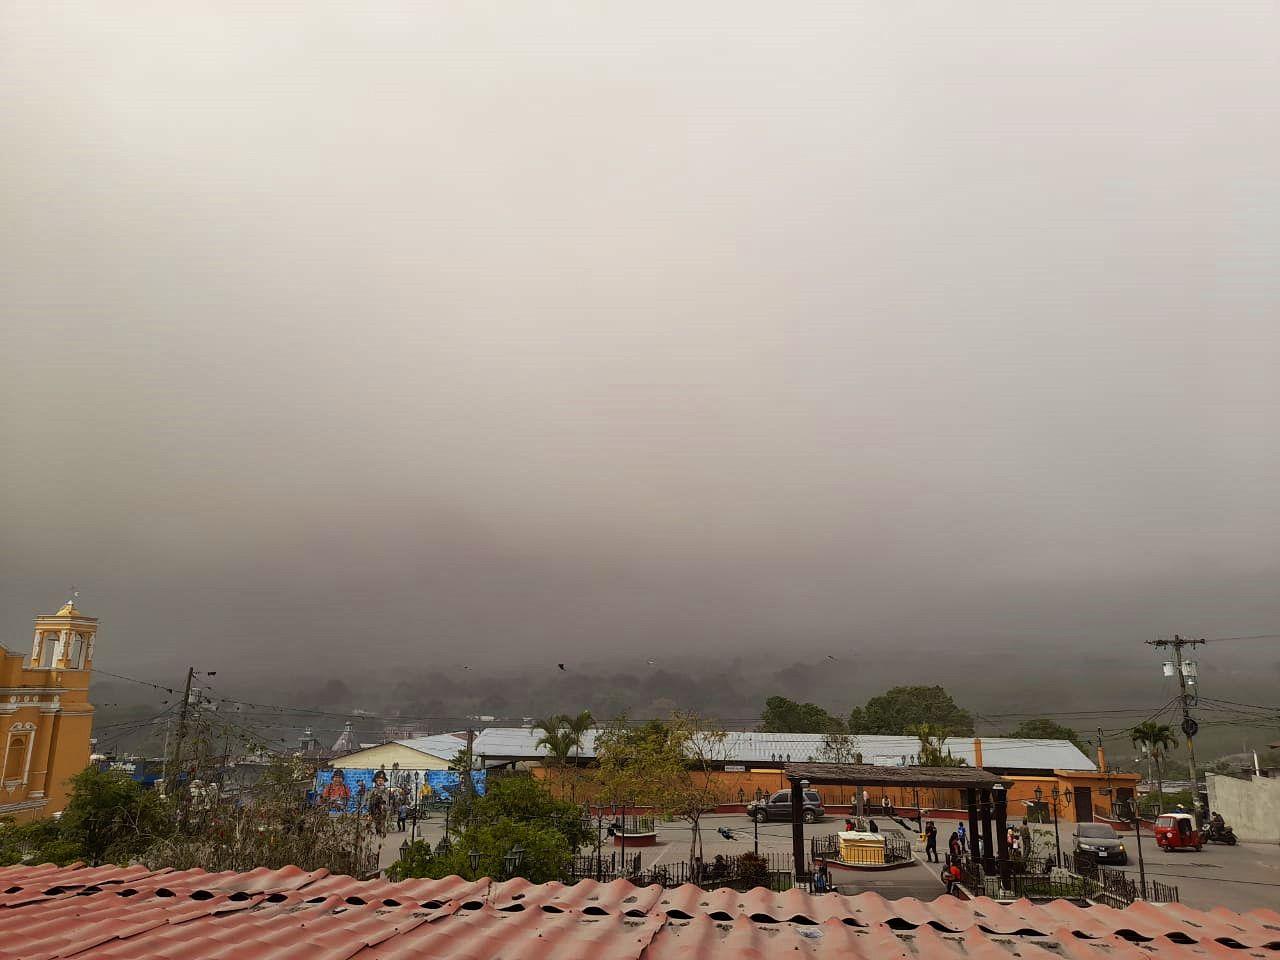 Fuego - atmosphère de chutes de cendres ce 14.02.2021  - photo Conred